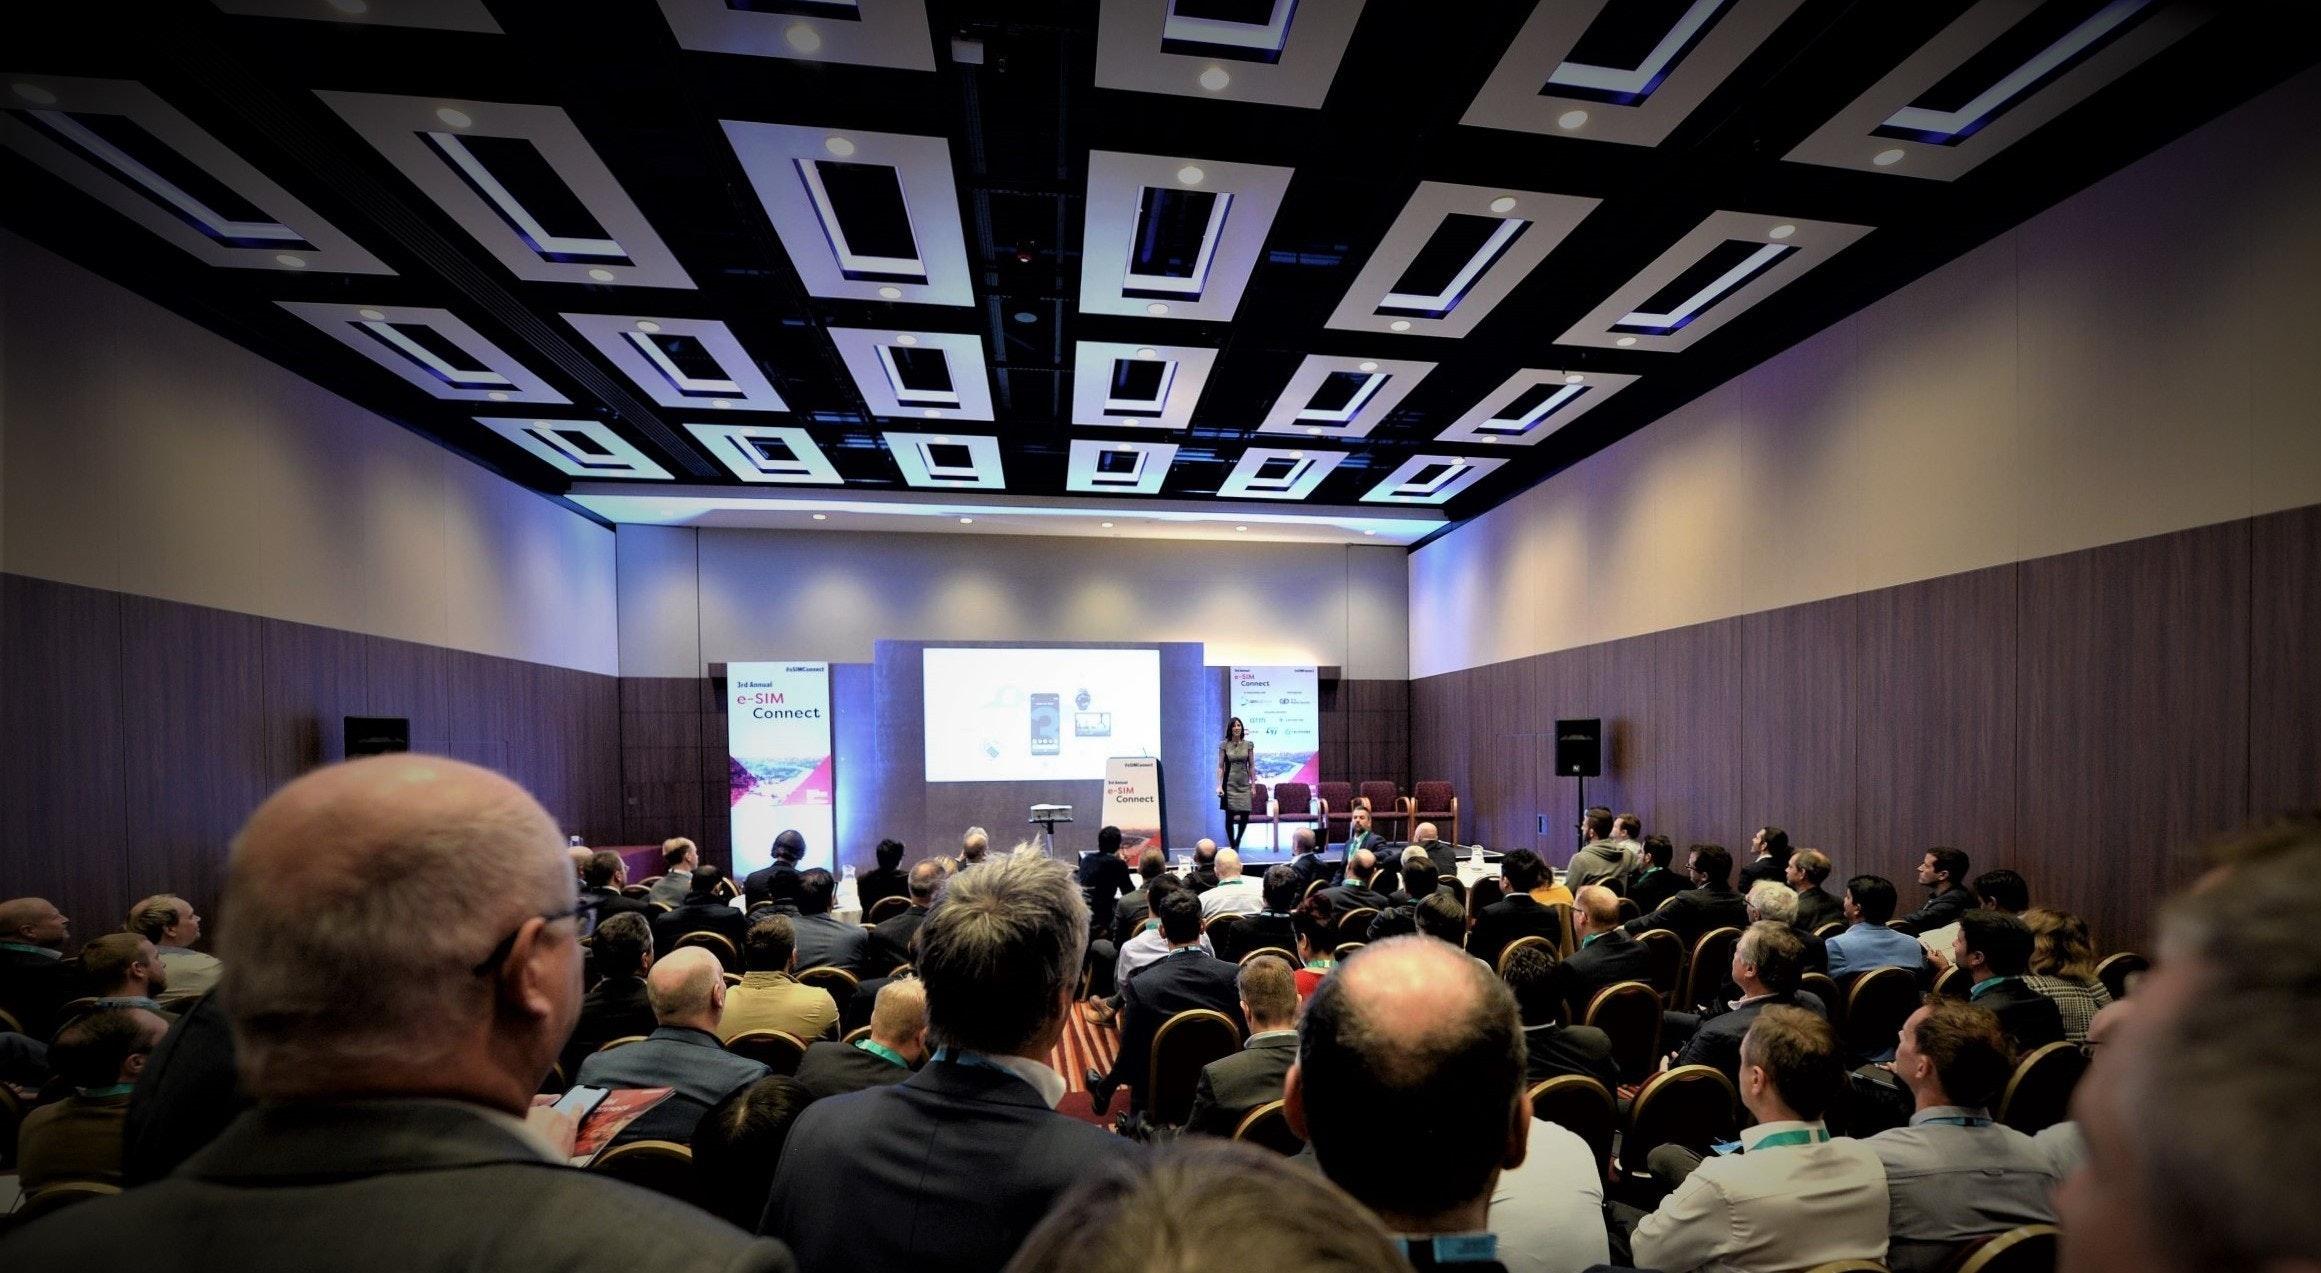 MVNOs Conference